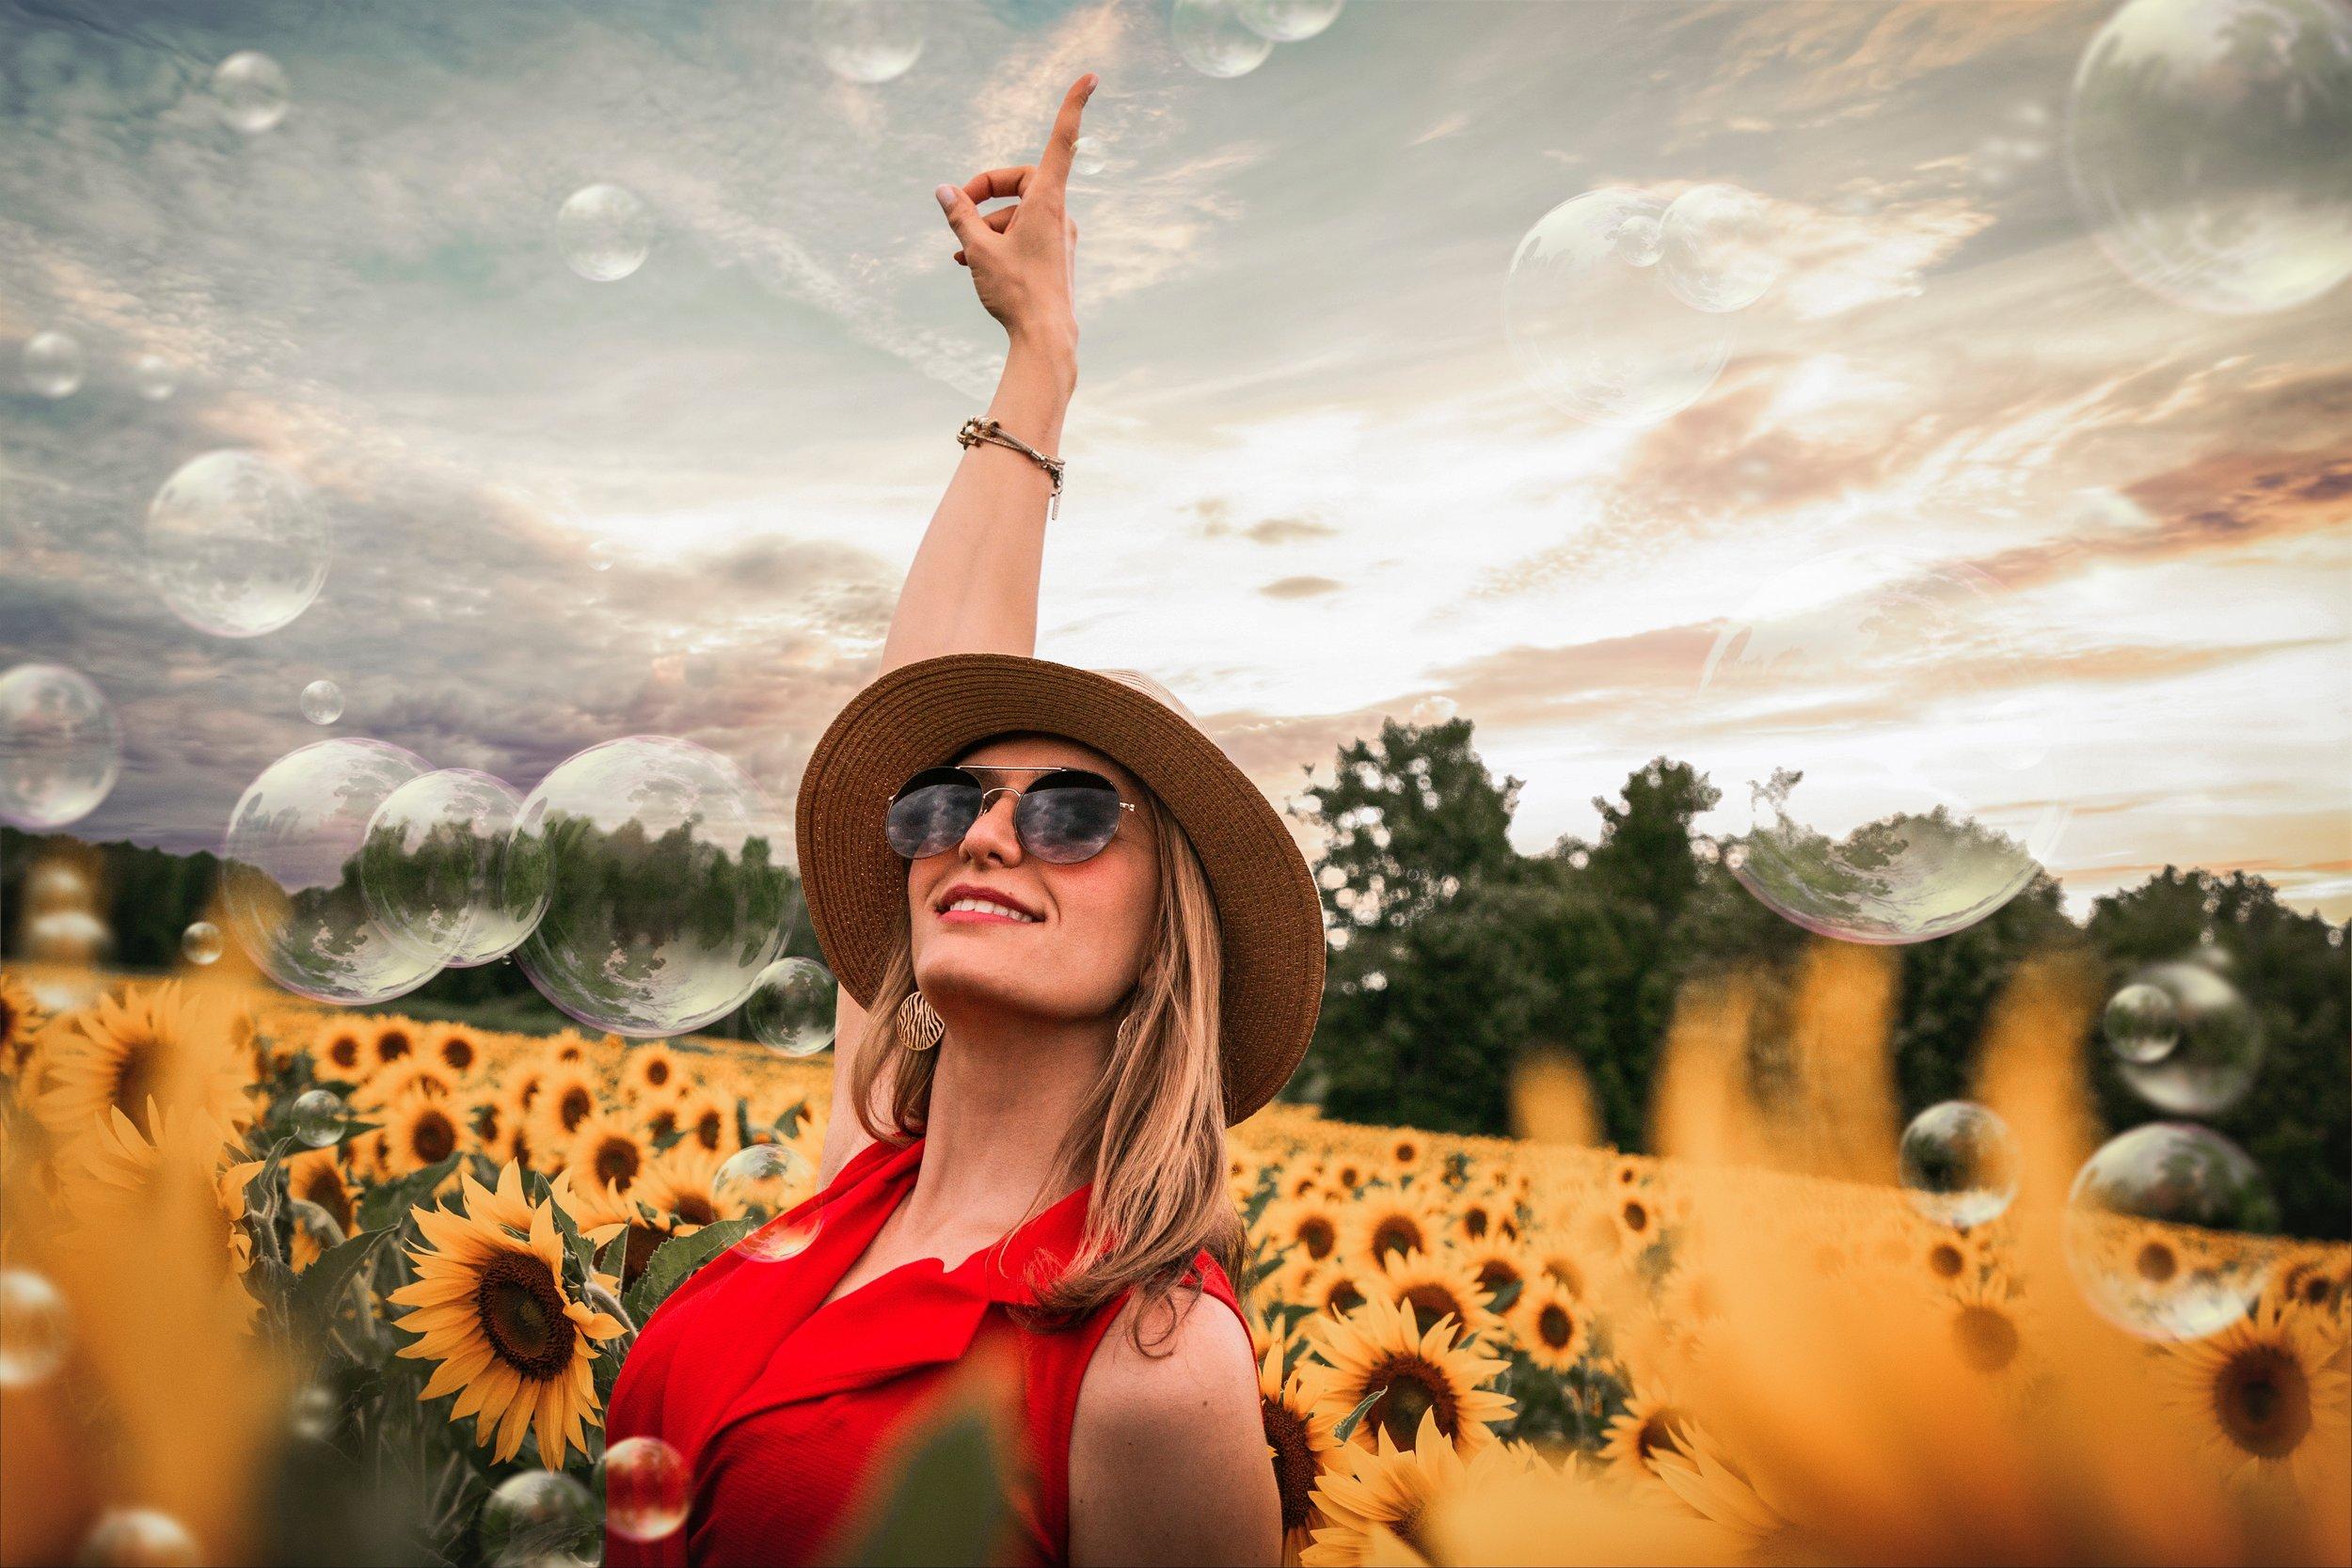 Dating pamagat ng florante på laura